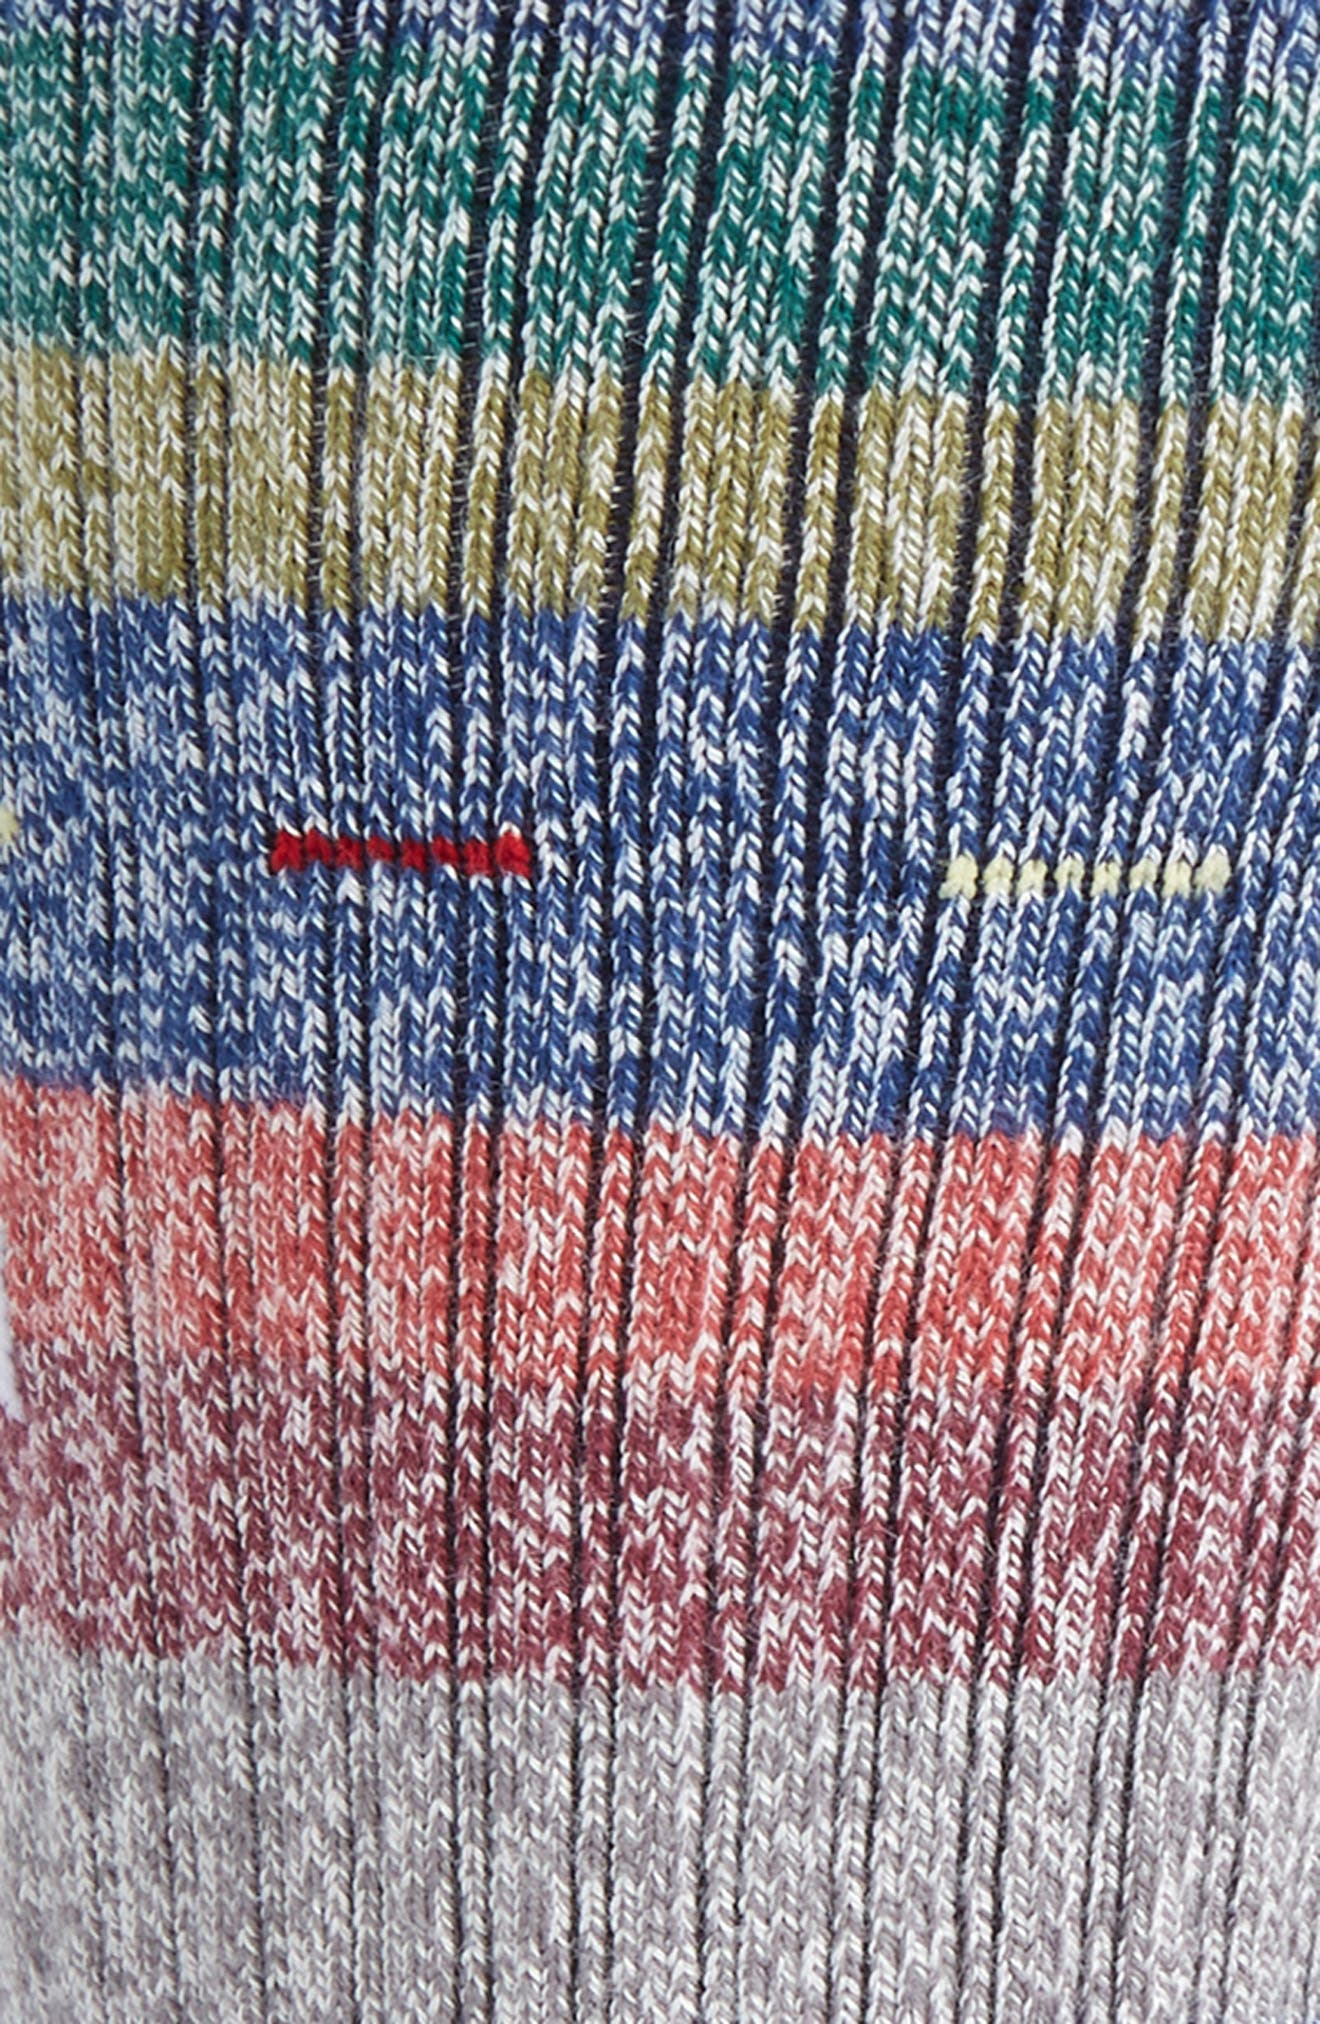 Vaucluse Stripe Socks,                             Alternate thumbnail 2, color,                             410